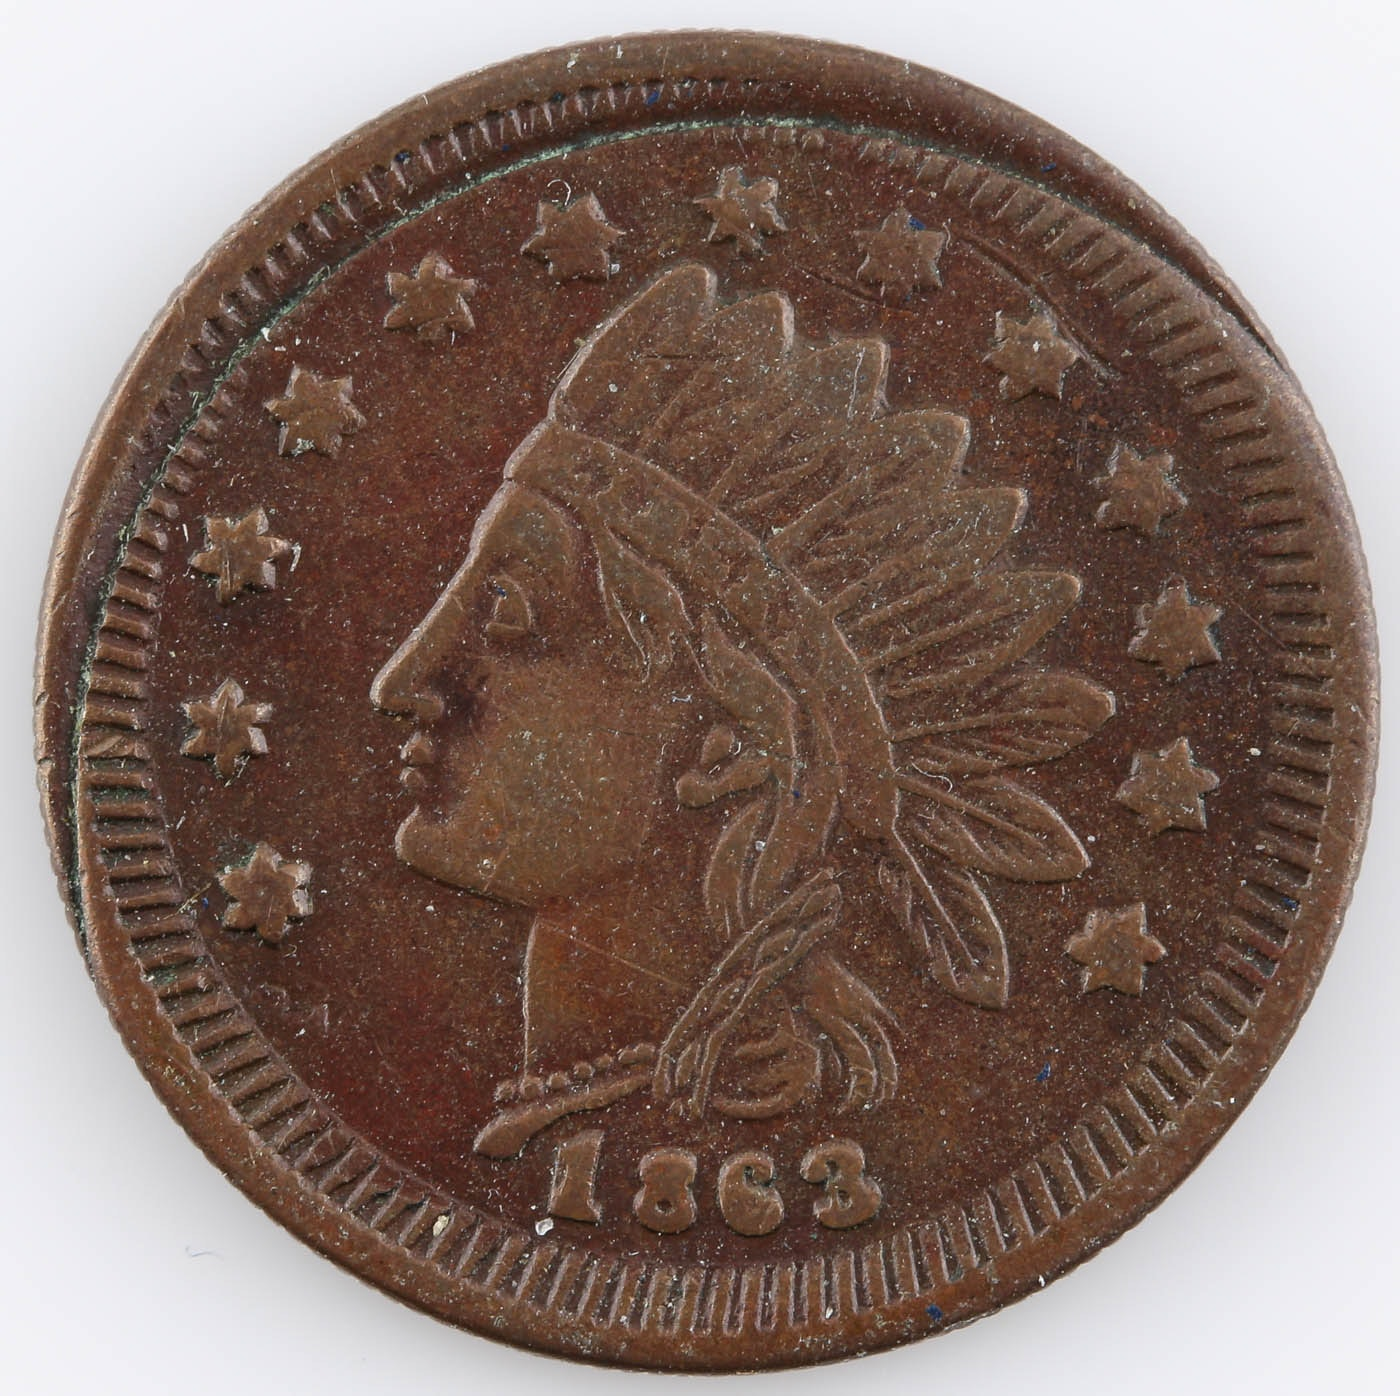 "1863 Civil War Store Token ""CITY FLOUR MILLS DETROIT"" on Reverse"